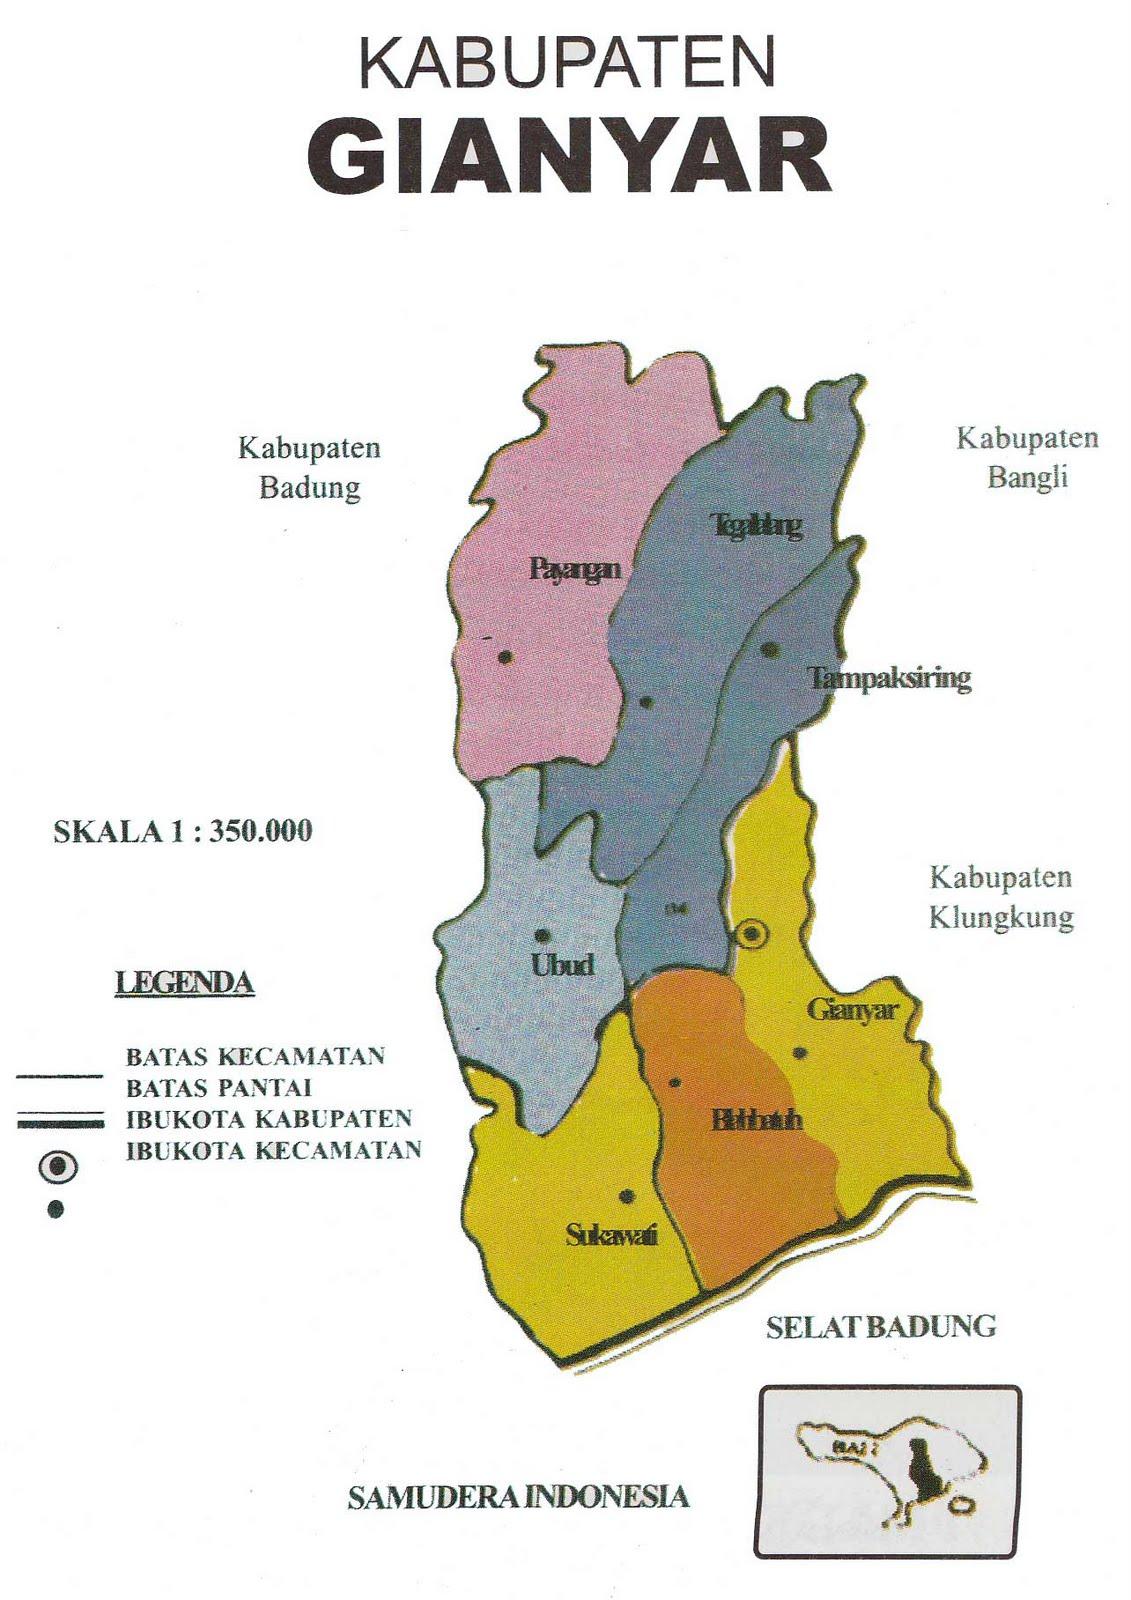 Sekilas Tentang Kabupaten Gianyar Bali Peta Goa Gajah Kab